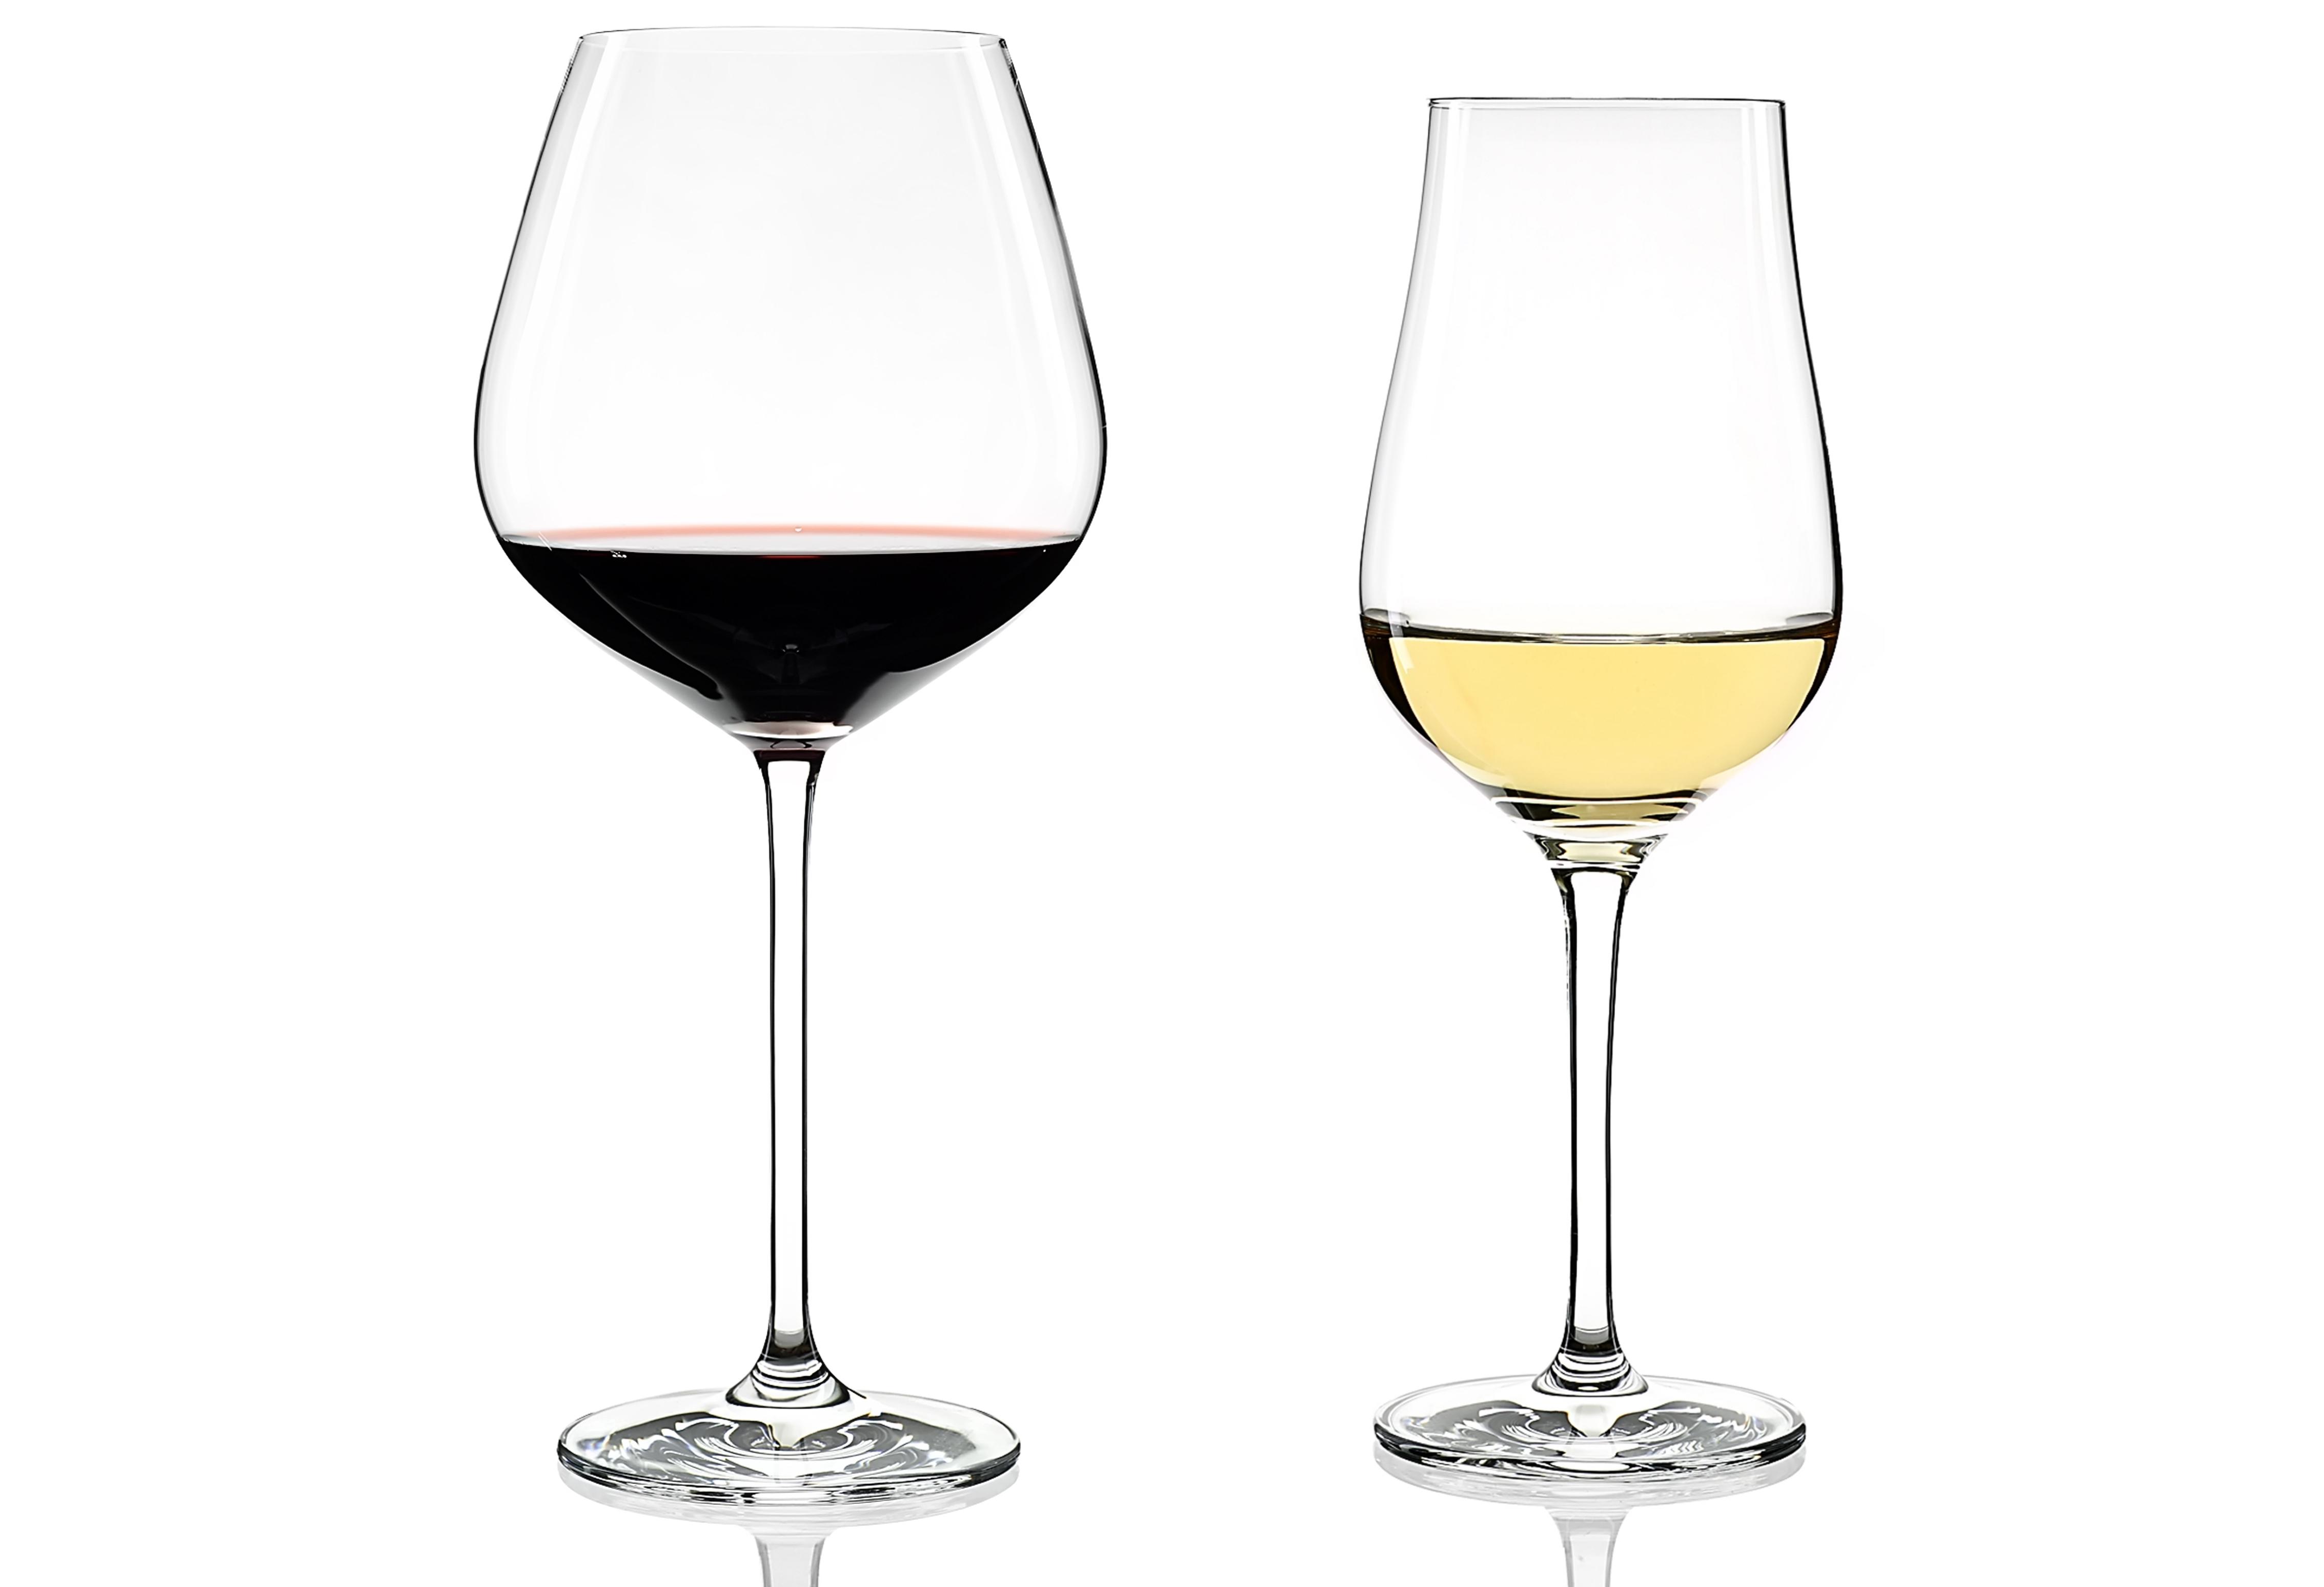 Level 2 / Wine Service